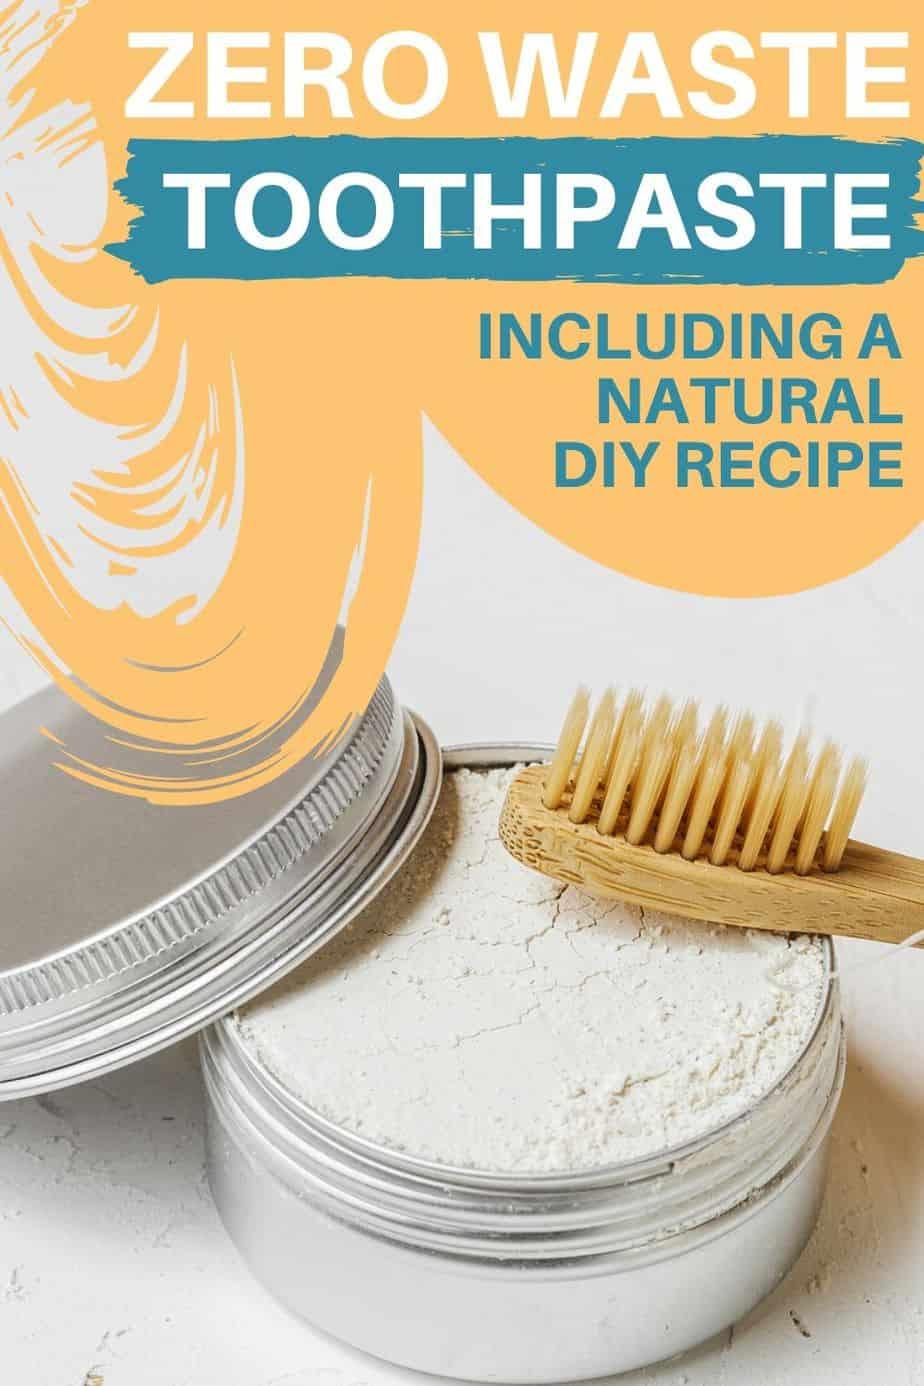 zero waste toothpaste - Pinterest image